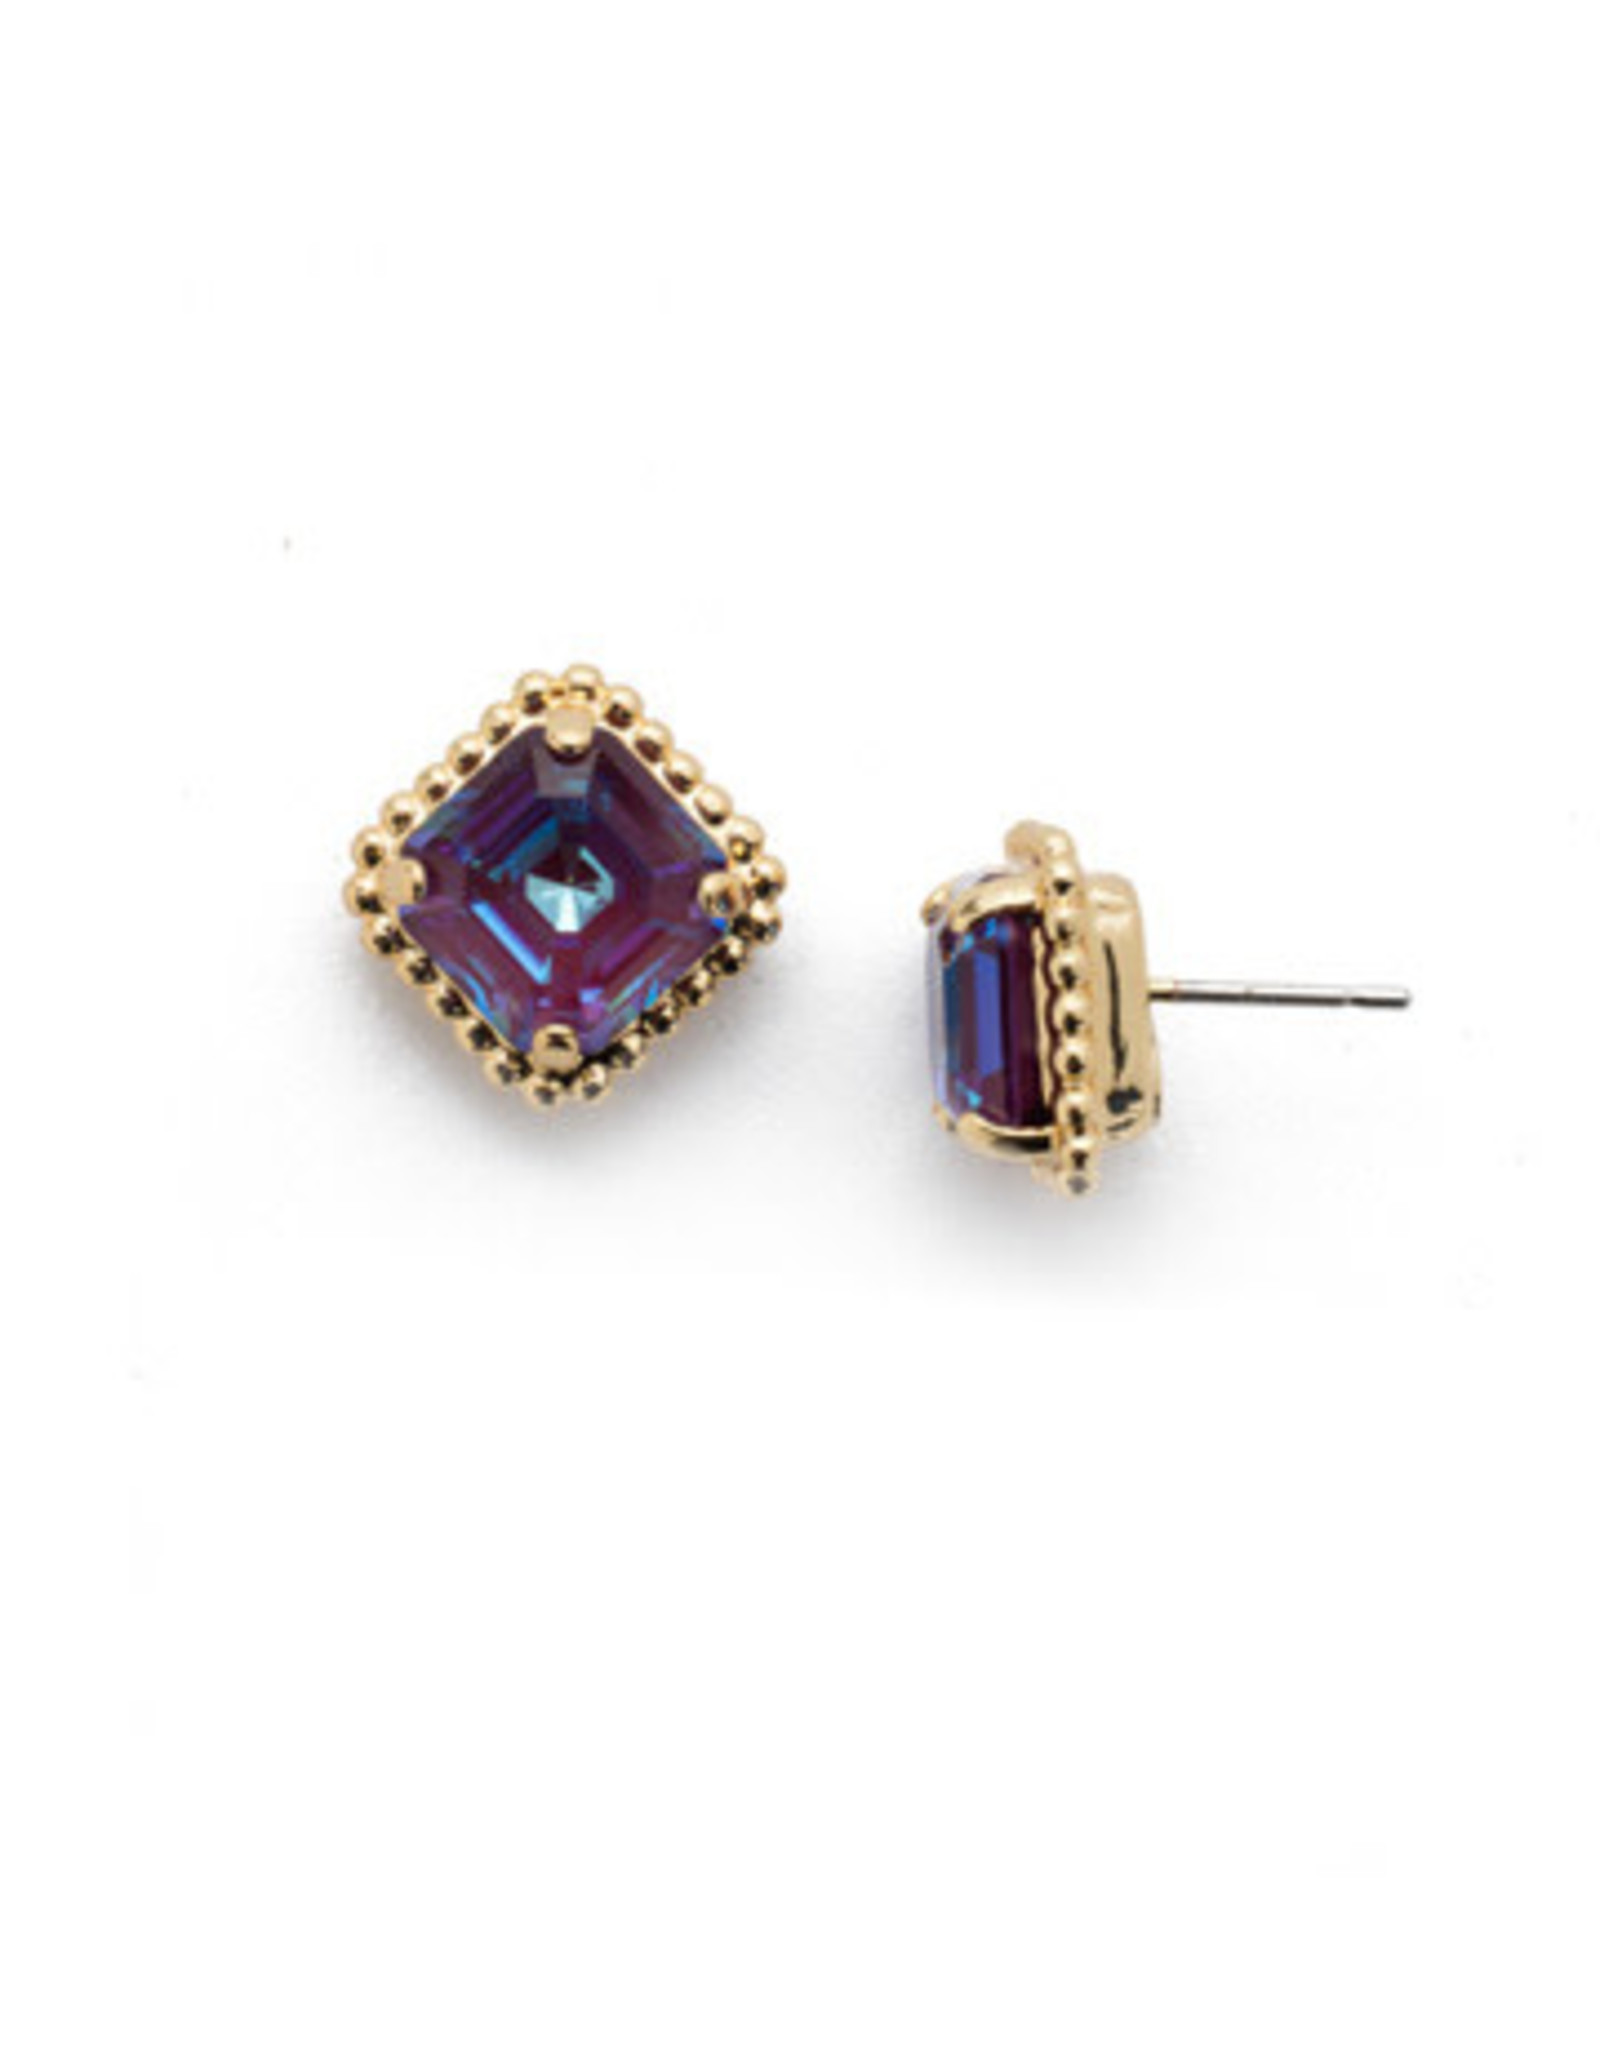 Sorrelli EBX10BGBGA - Begonia Cushion-Cut Solitaire Stud Earrings